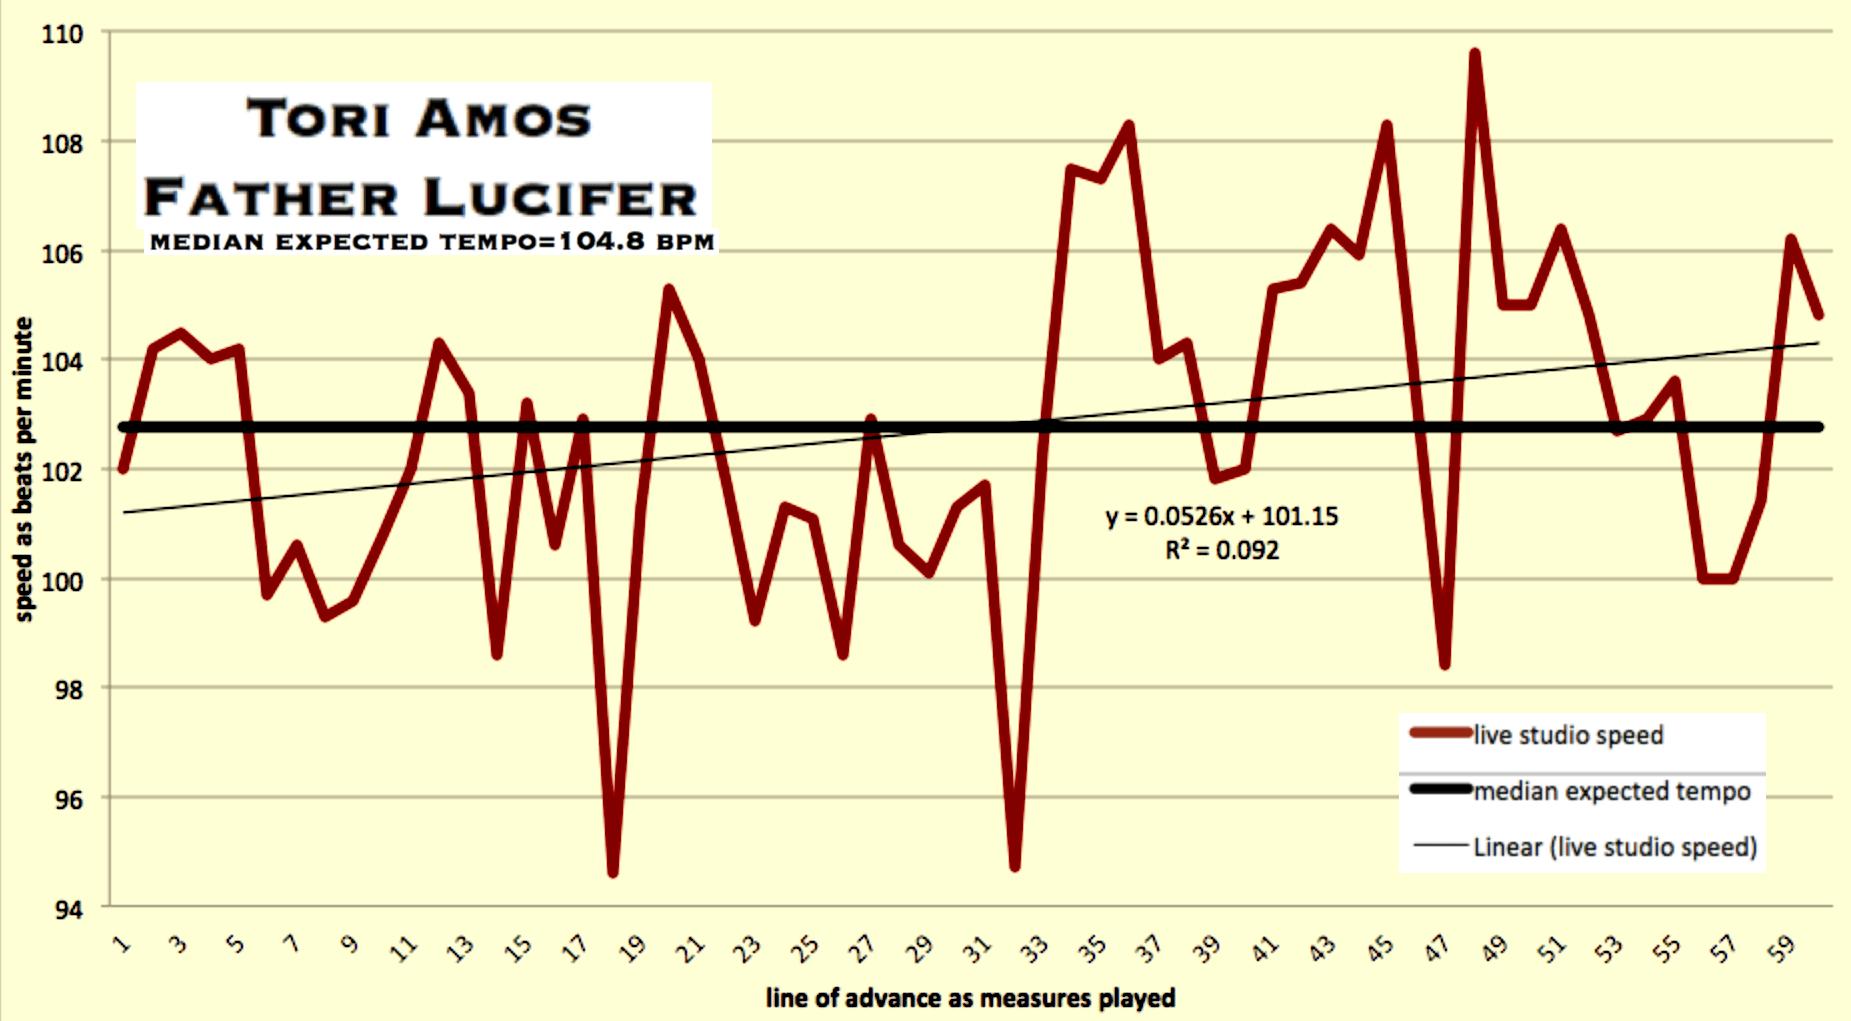 father-lucifer-tori-amos-matherton_tempo_map